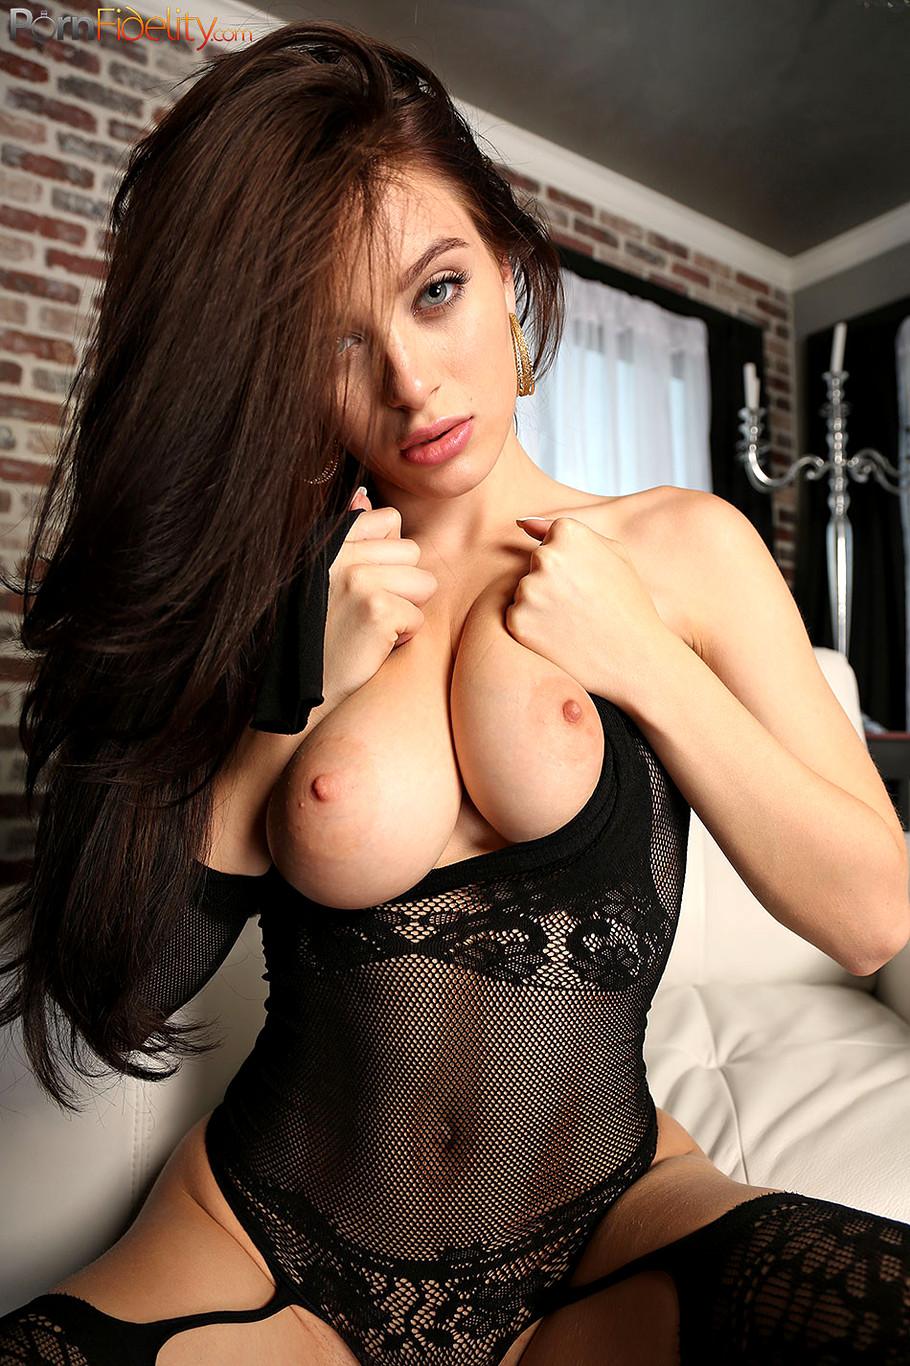 Lana rhoades stripping porn